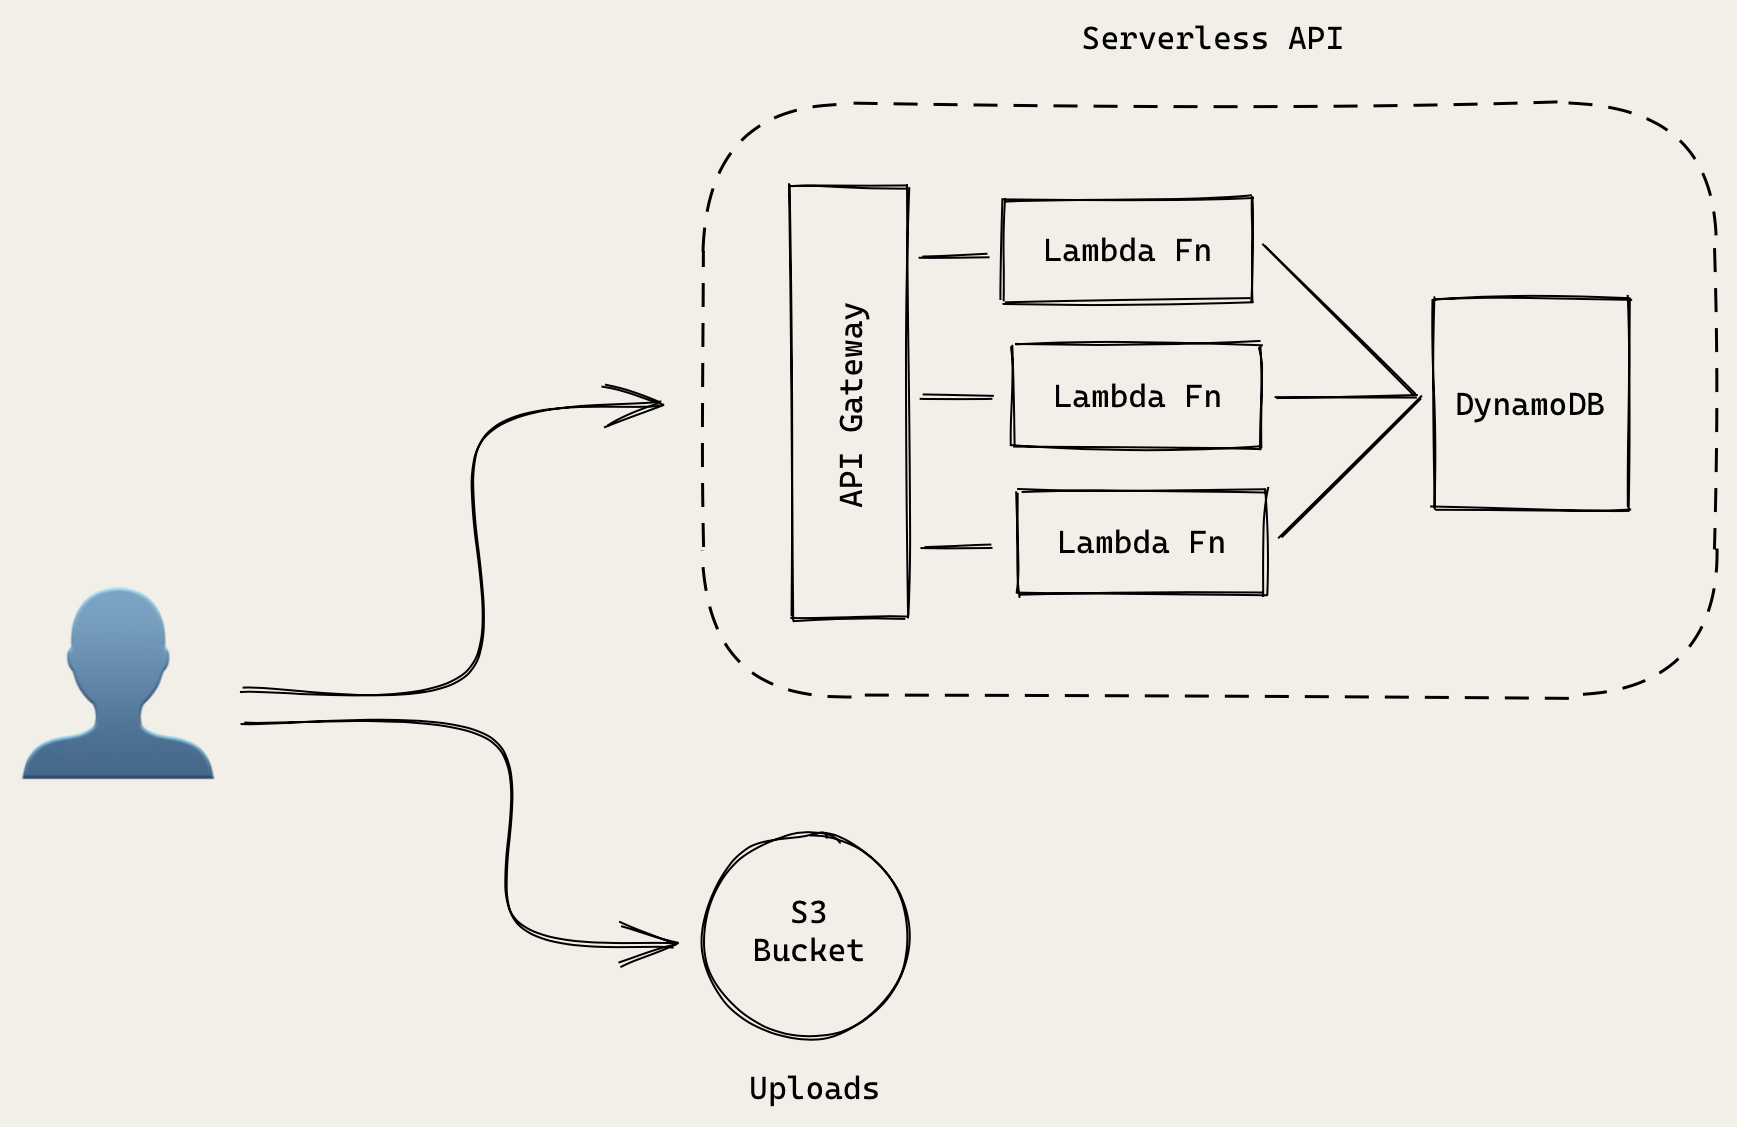 Serverless public API architecture